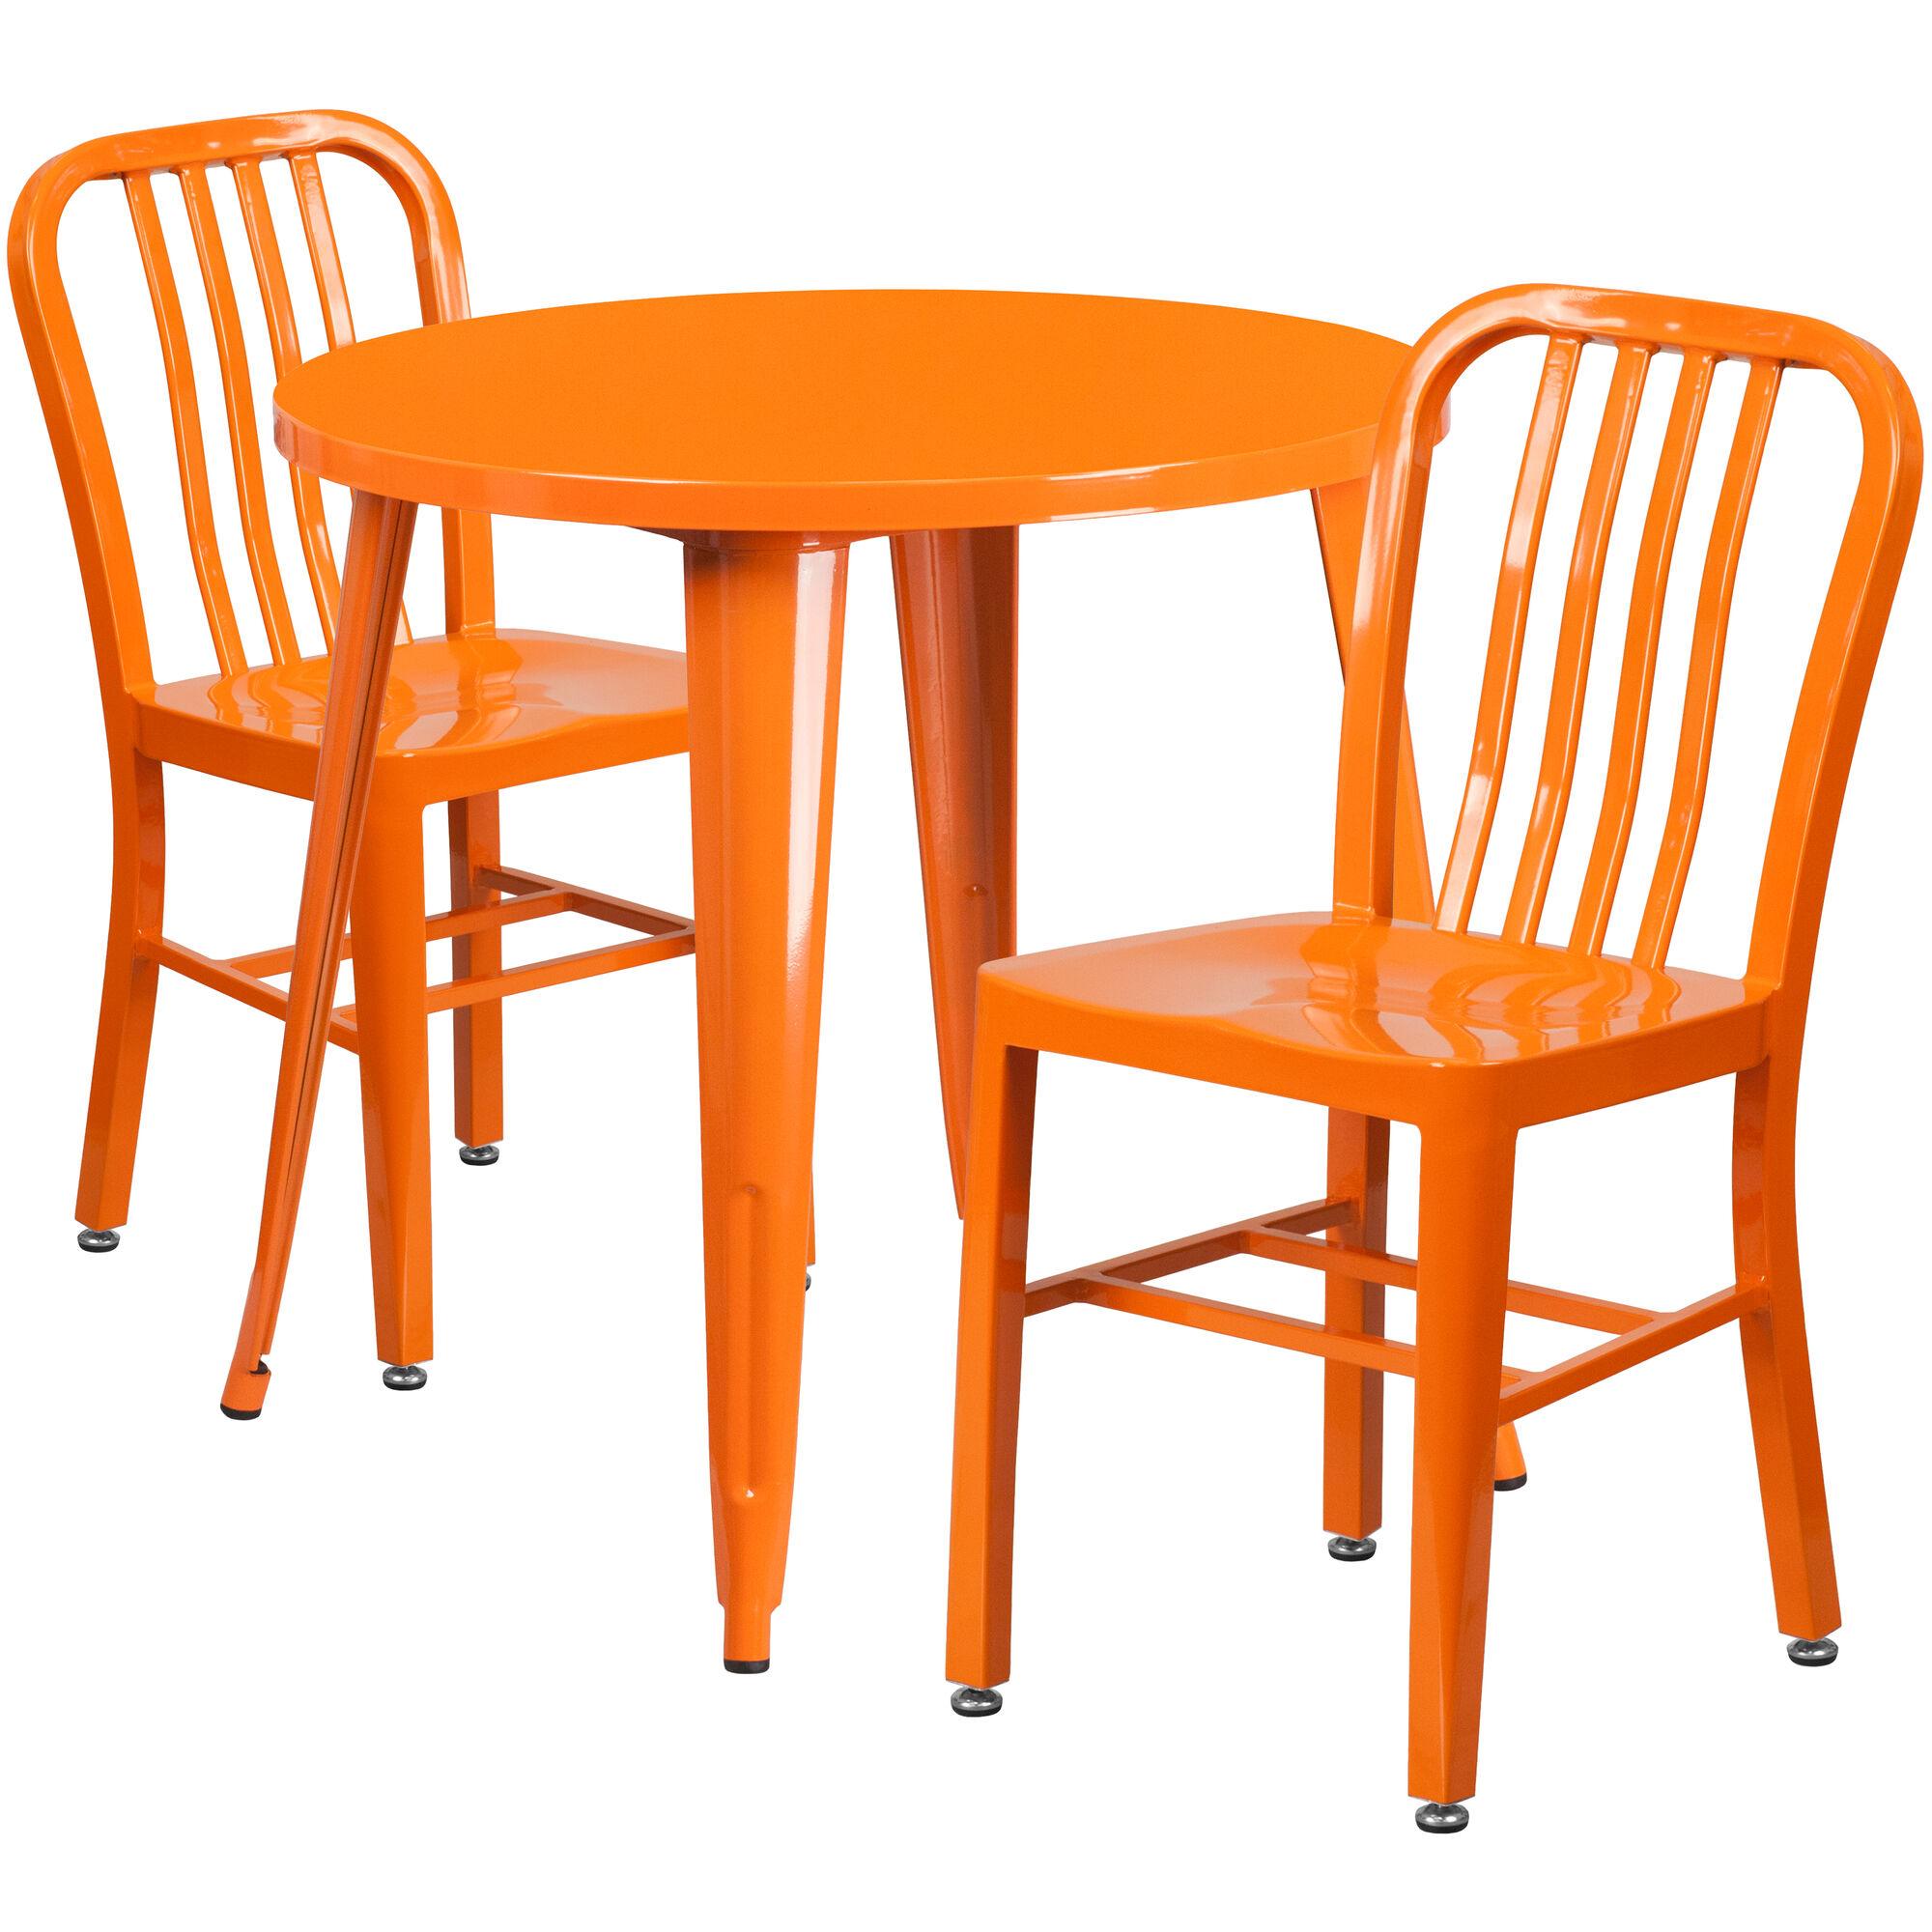 Flash furniture 30 39 39 round orange metal indoor outdoor for Html vertical table